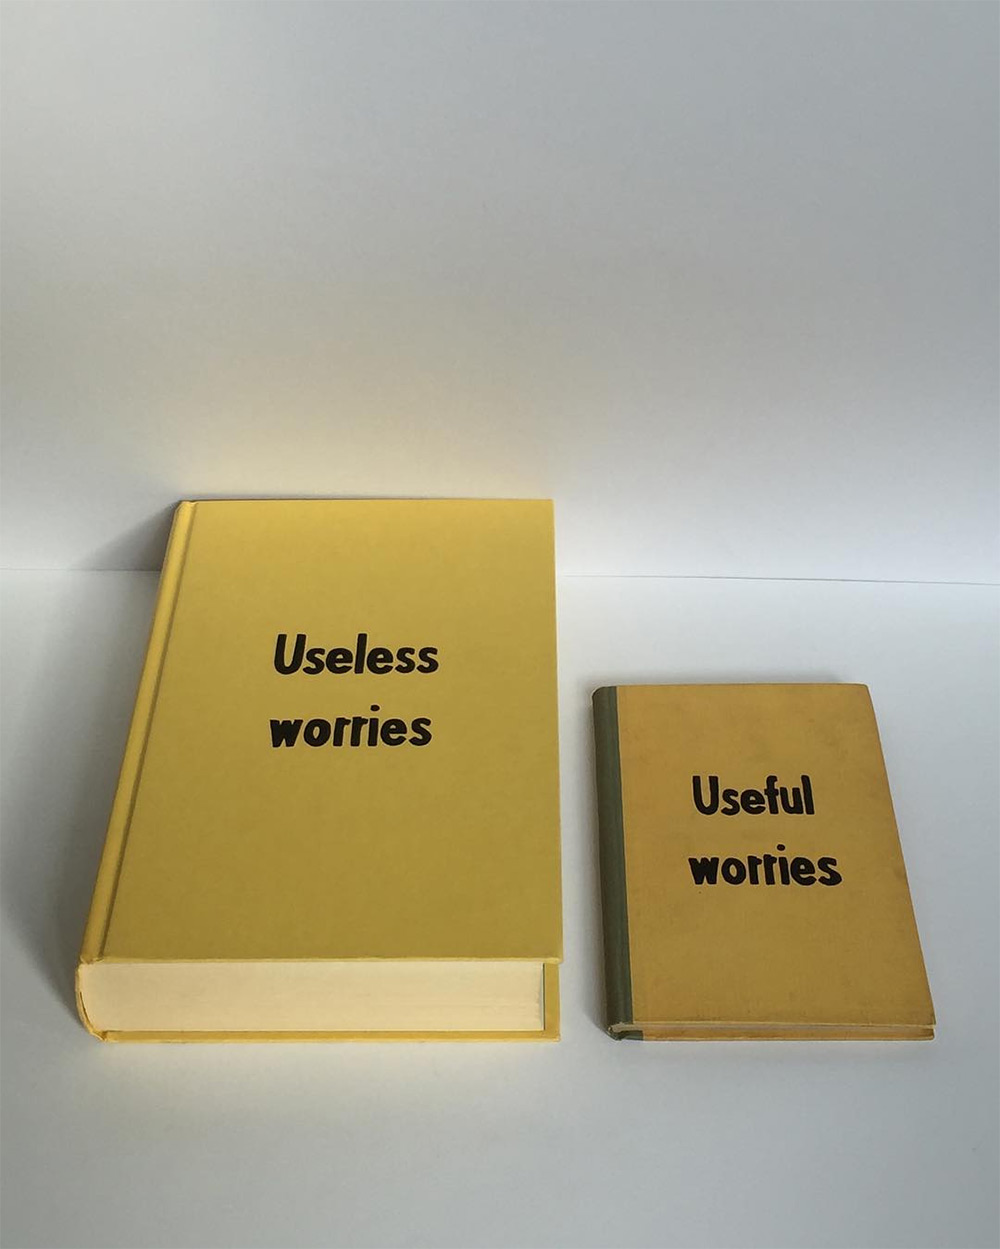 Gli ironici self-help book di Johan Deckmann   Collater.al 9